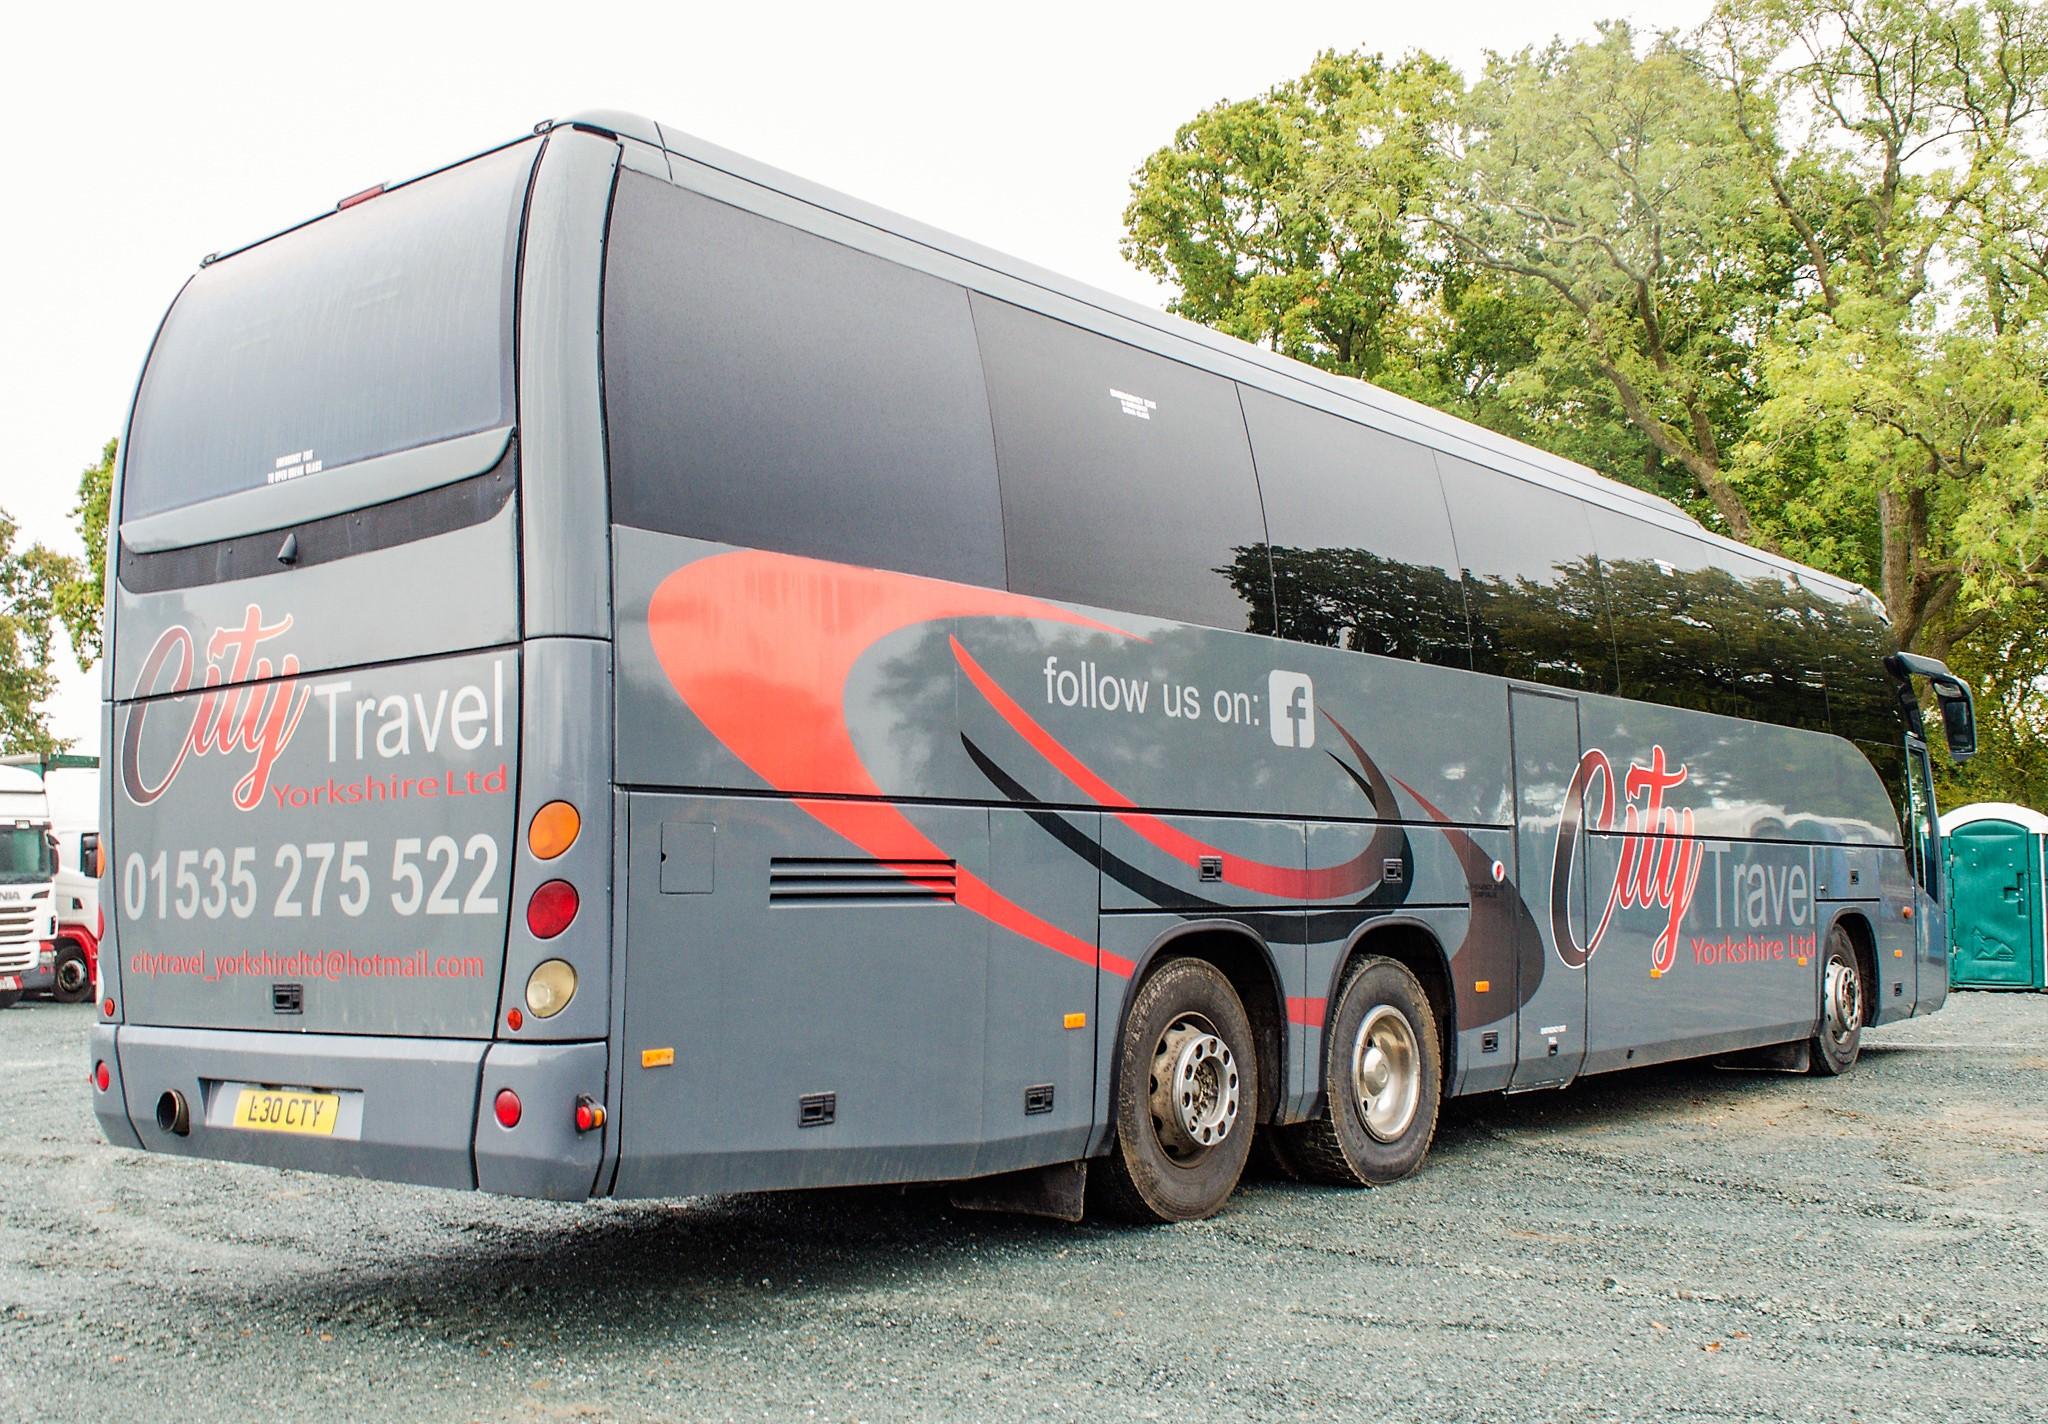 MAN F2000 Beulas Aura 54 seat luxury coach Registration Number: KC08 KTC Date of Registration: 30/ - Image 4 of 19